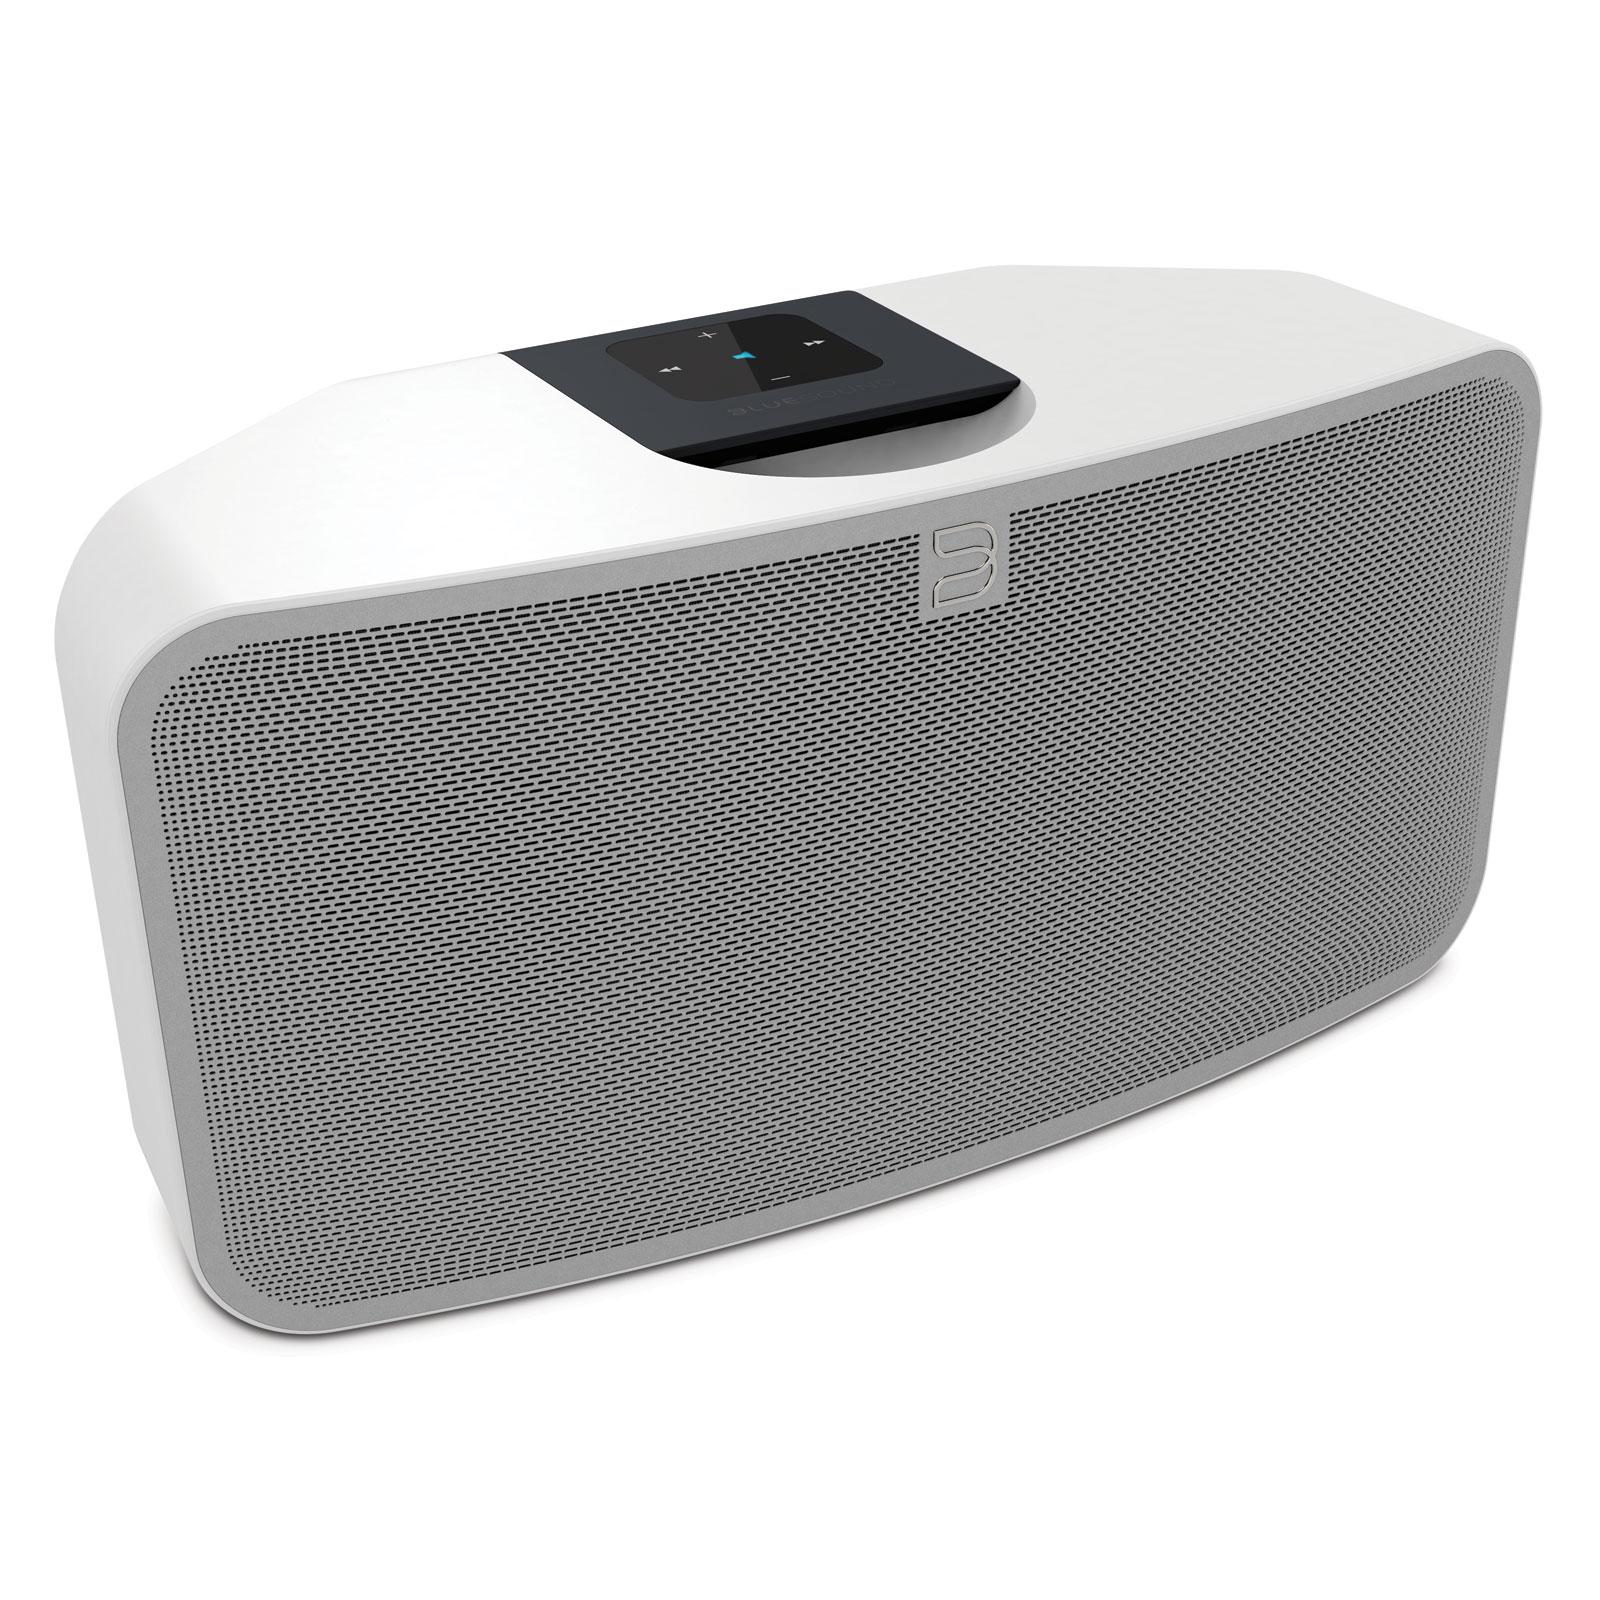 Dock & Enceinte Bluetooth Bluesound Pulse Mini Blanc Système audio multiroom avec Wi-Fi, Bluetooth pour Streaming audio et Web radio compatible Hi-Res Audio